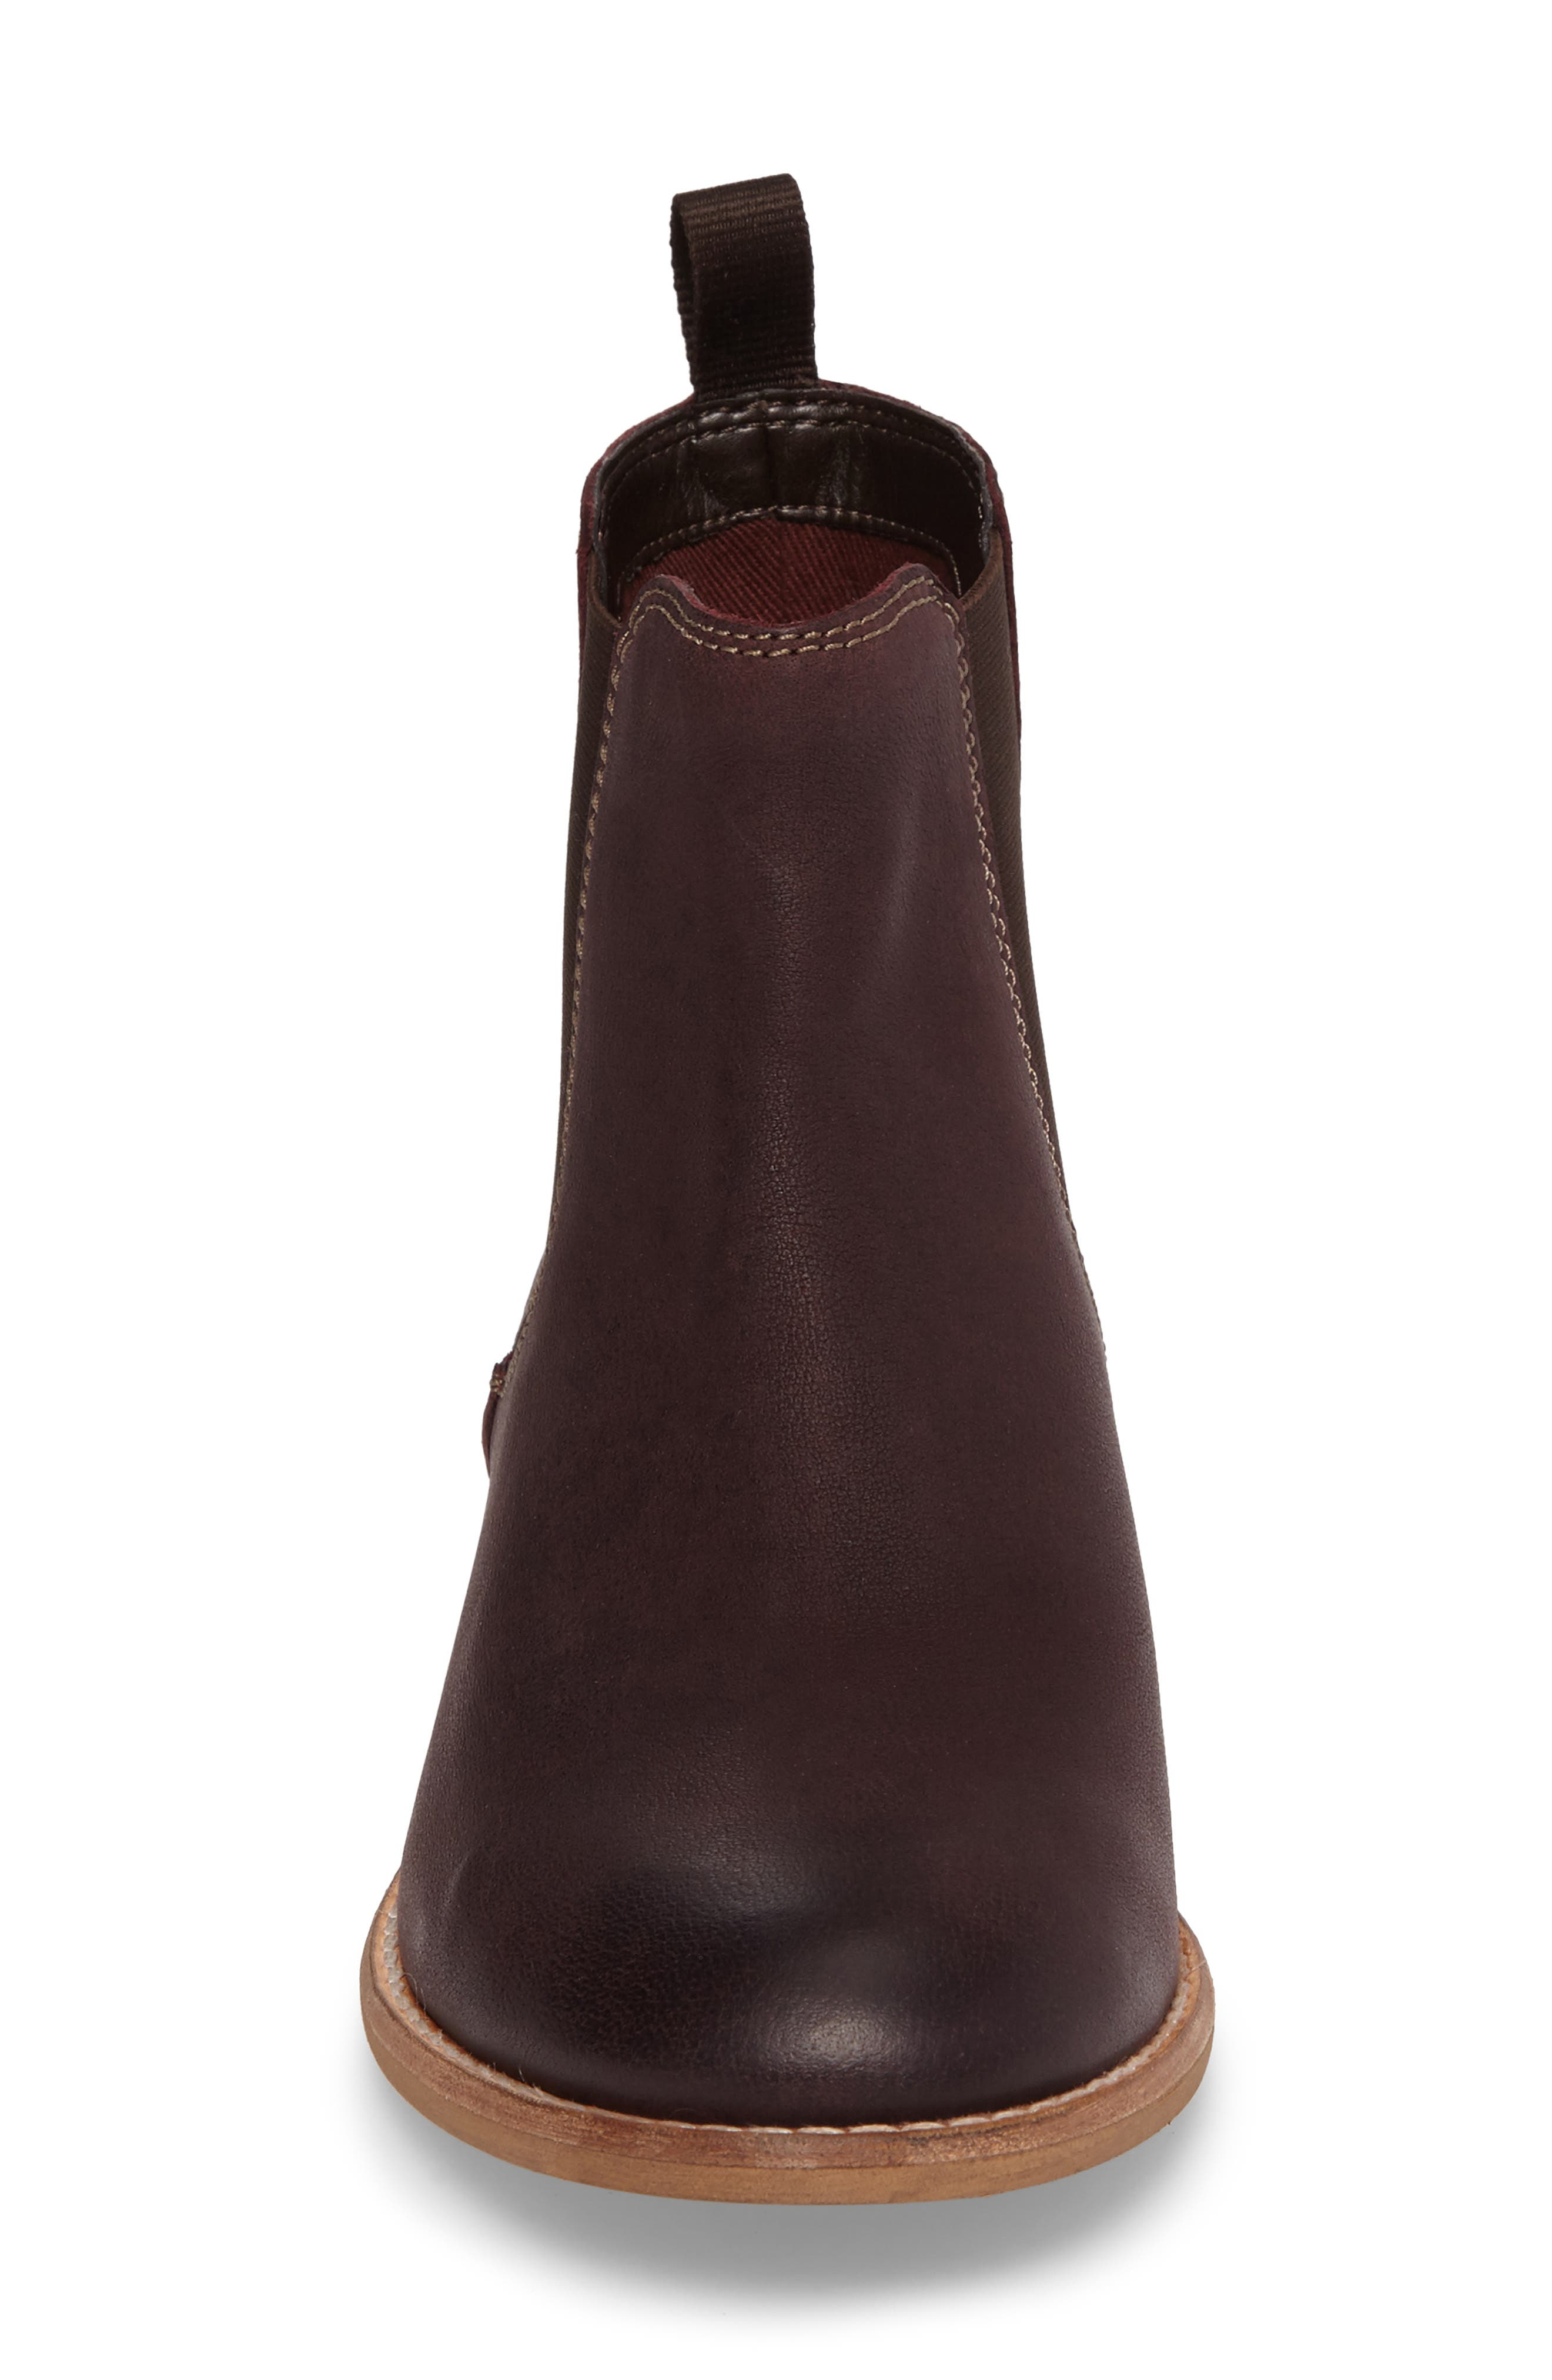 Maypearl Nala Bootie,                             Alternate thumbnail 4, color,                             Burgundy Leather